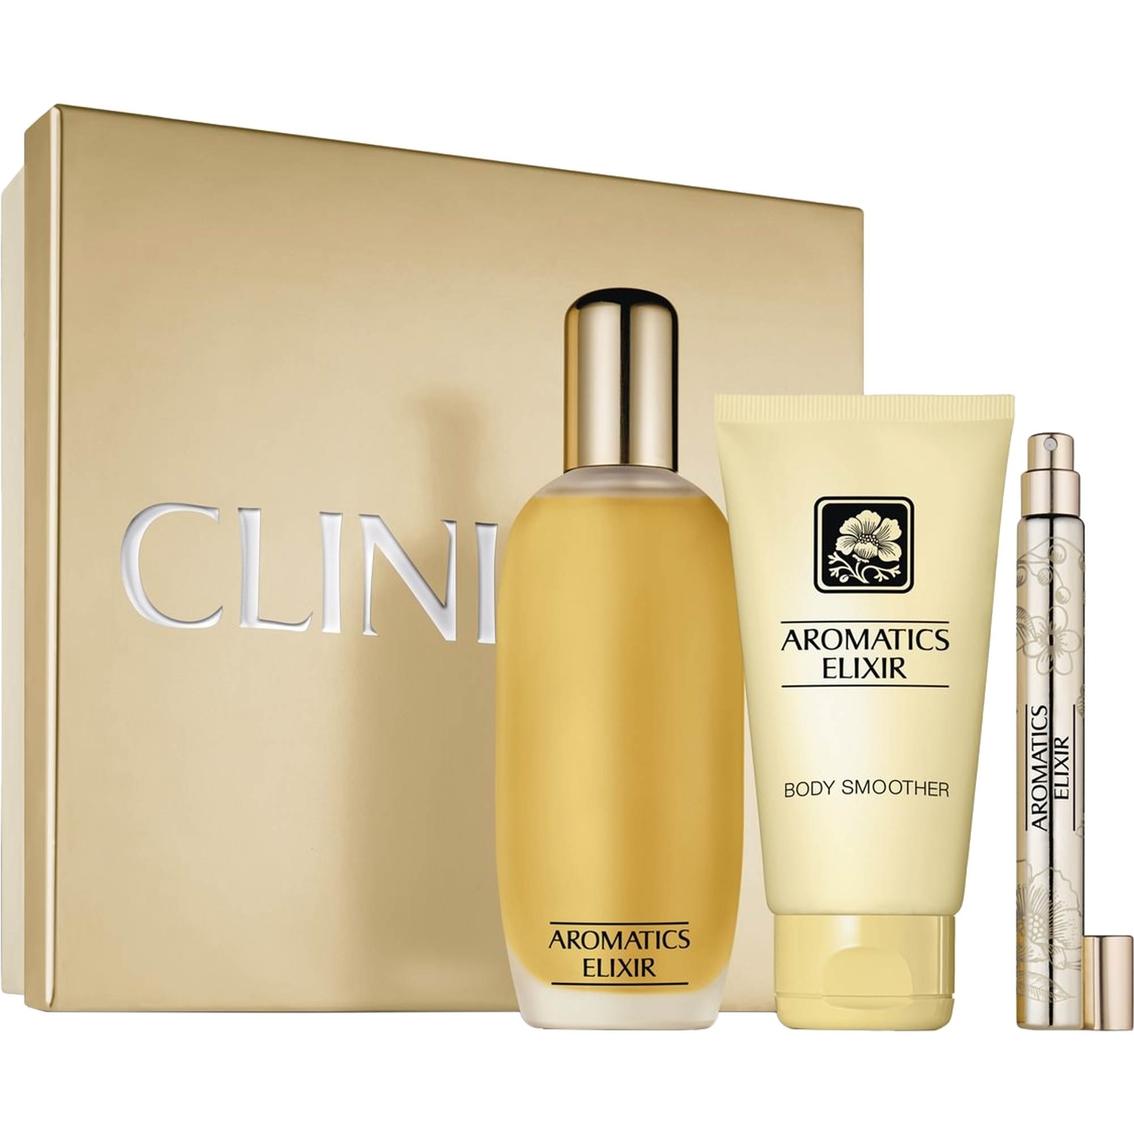 Clinique aromatics elixir essentials trio gifts sets for